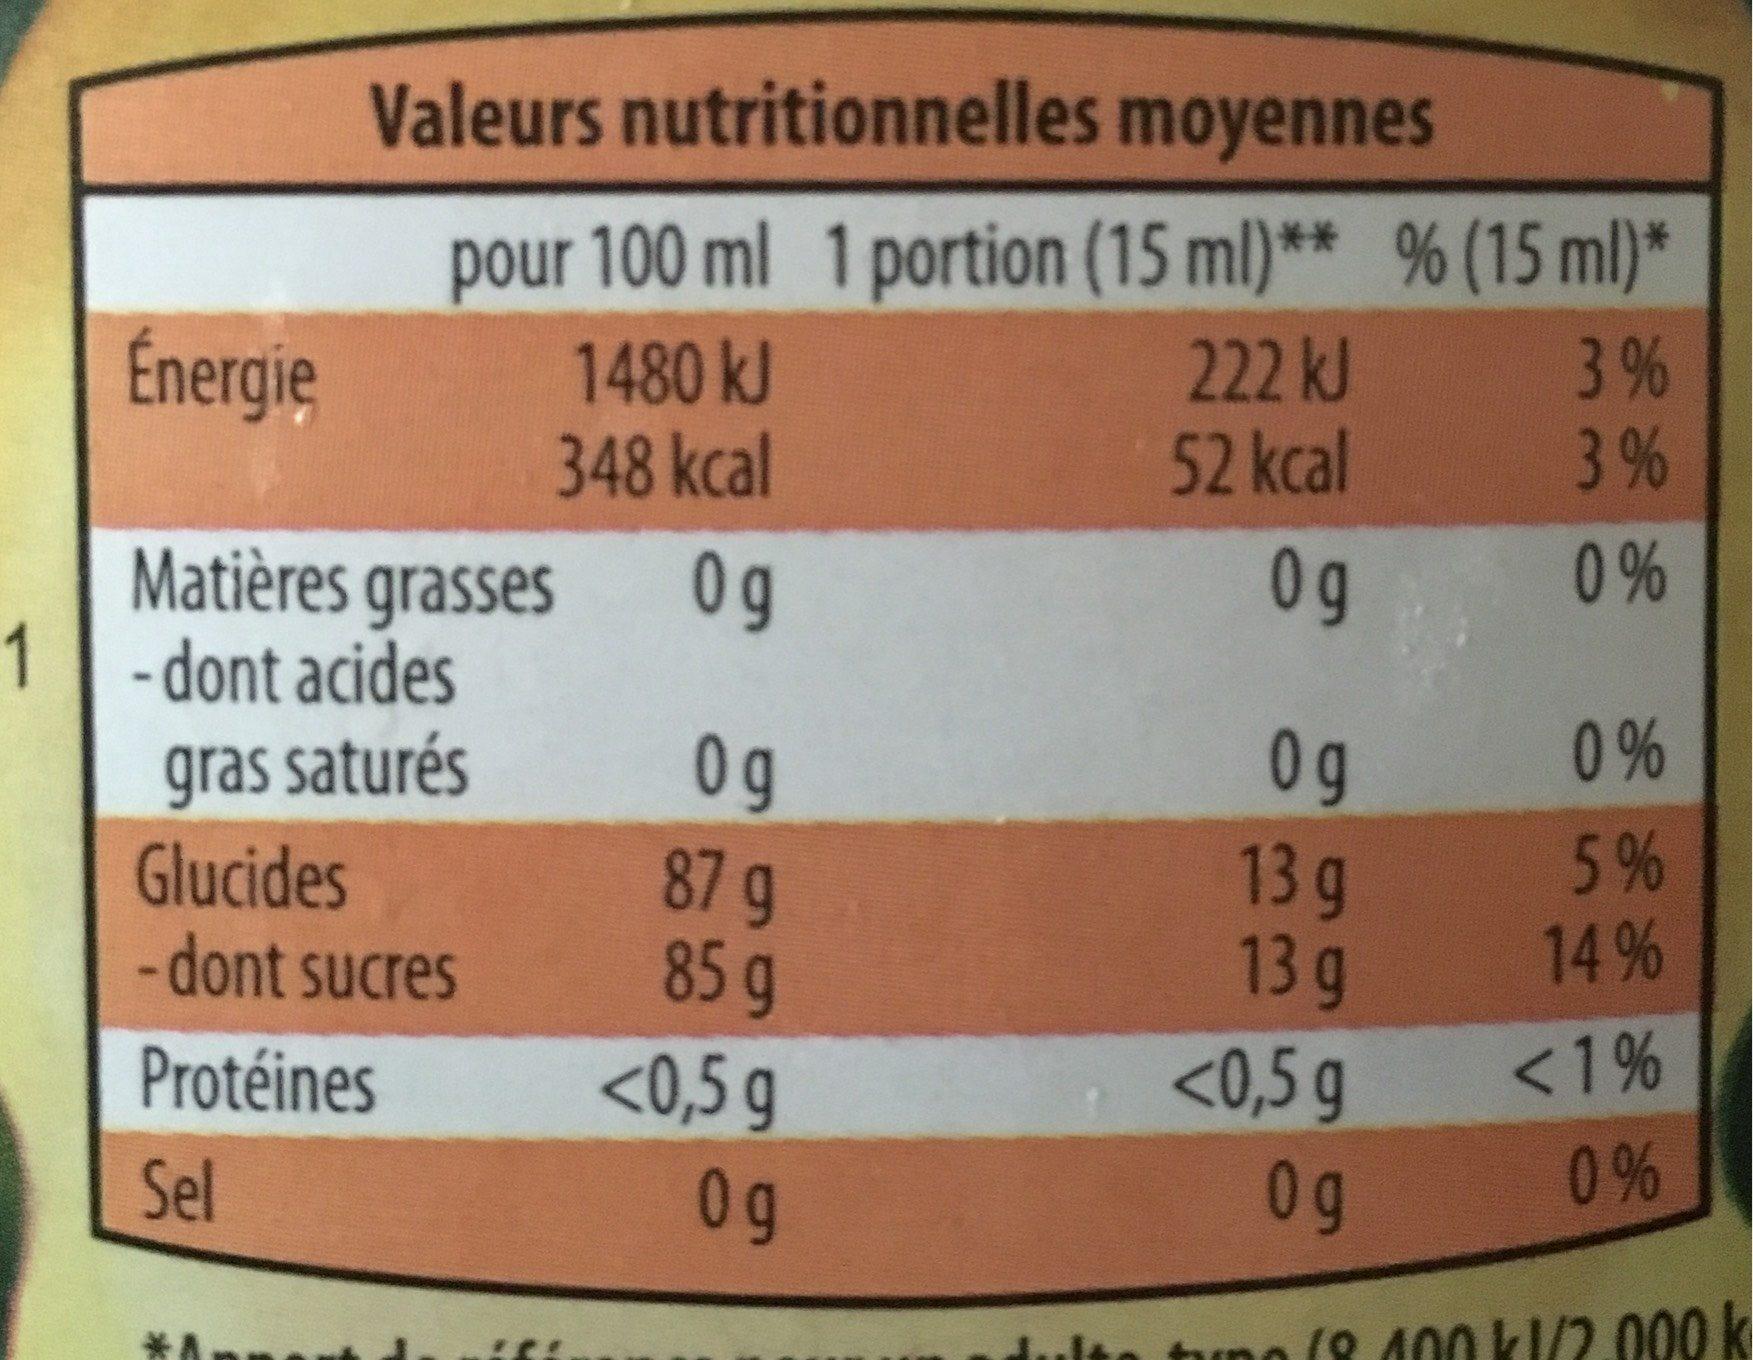 Sirop D'Érable - Nutrition facts - fr